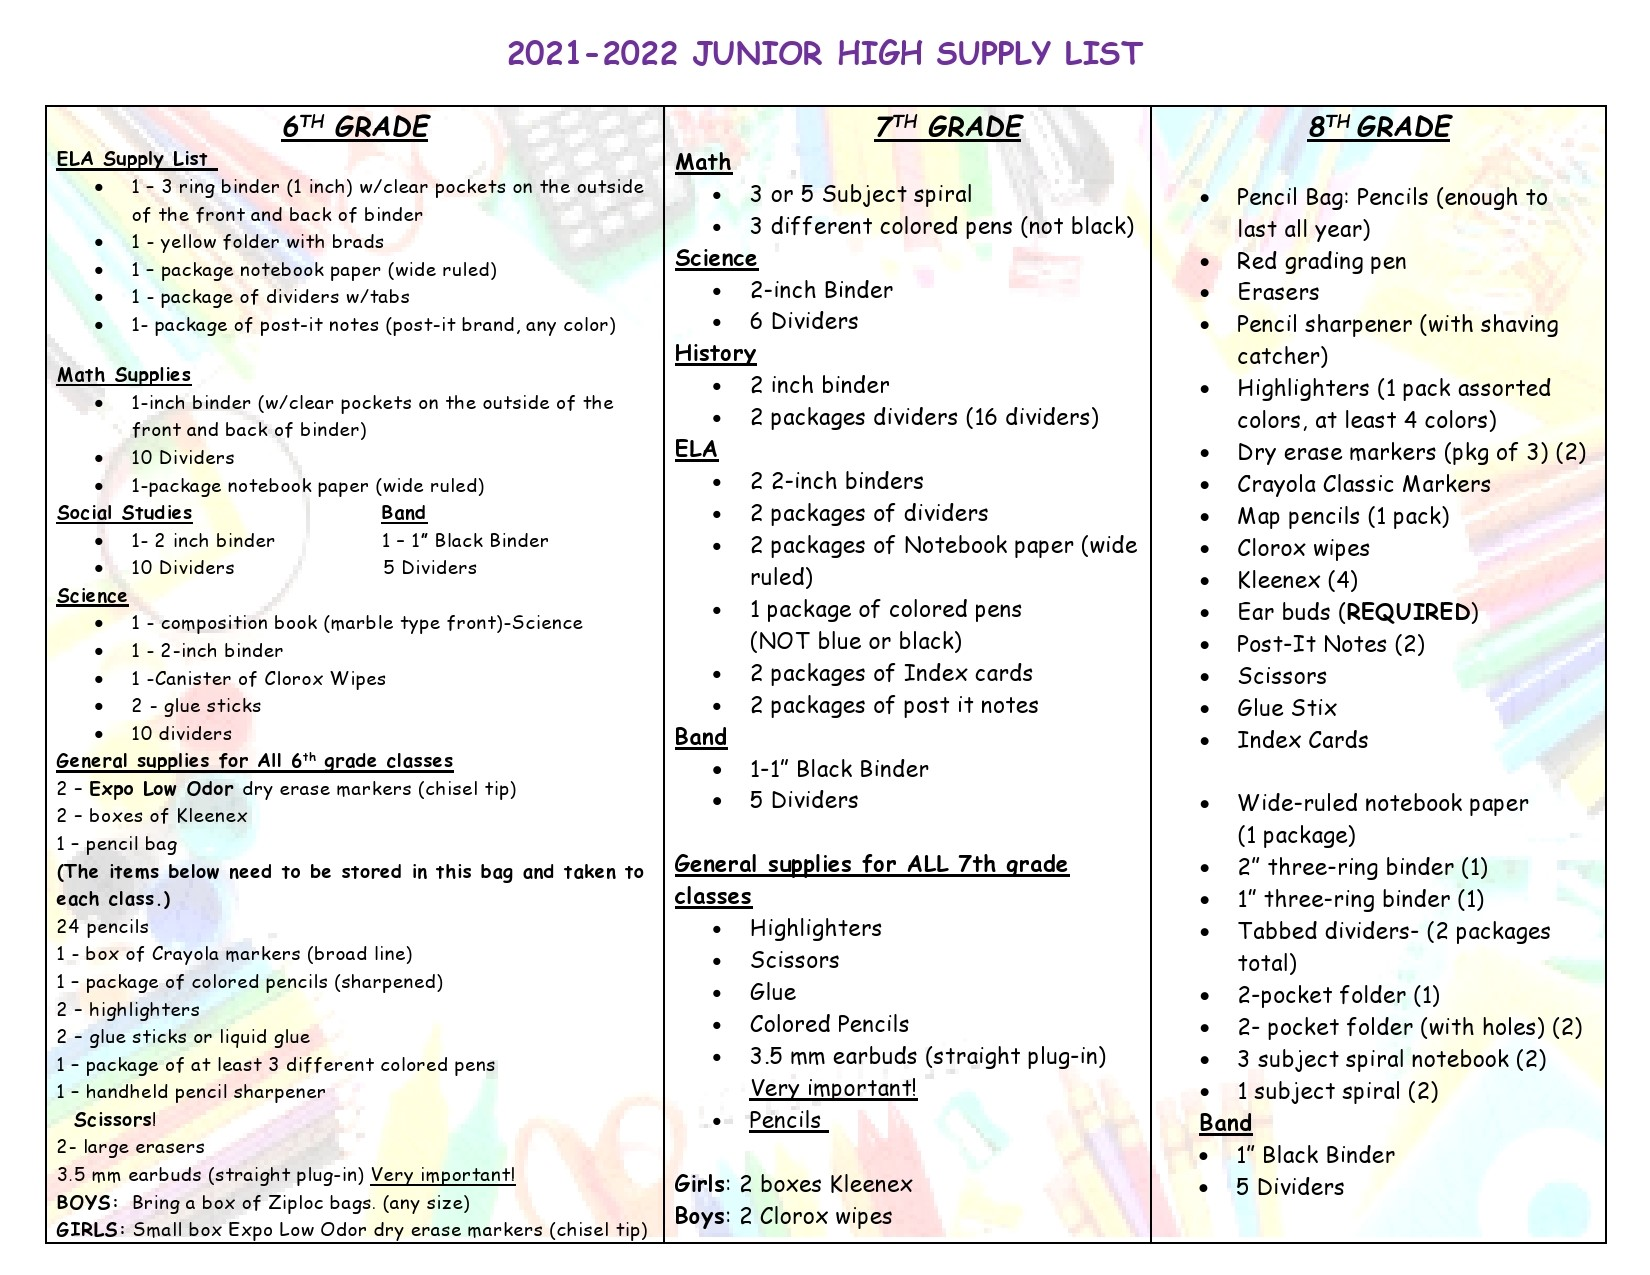 2021-2022 Jr. High supply list